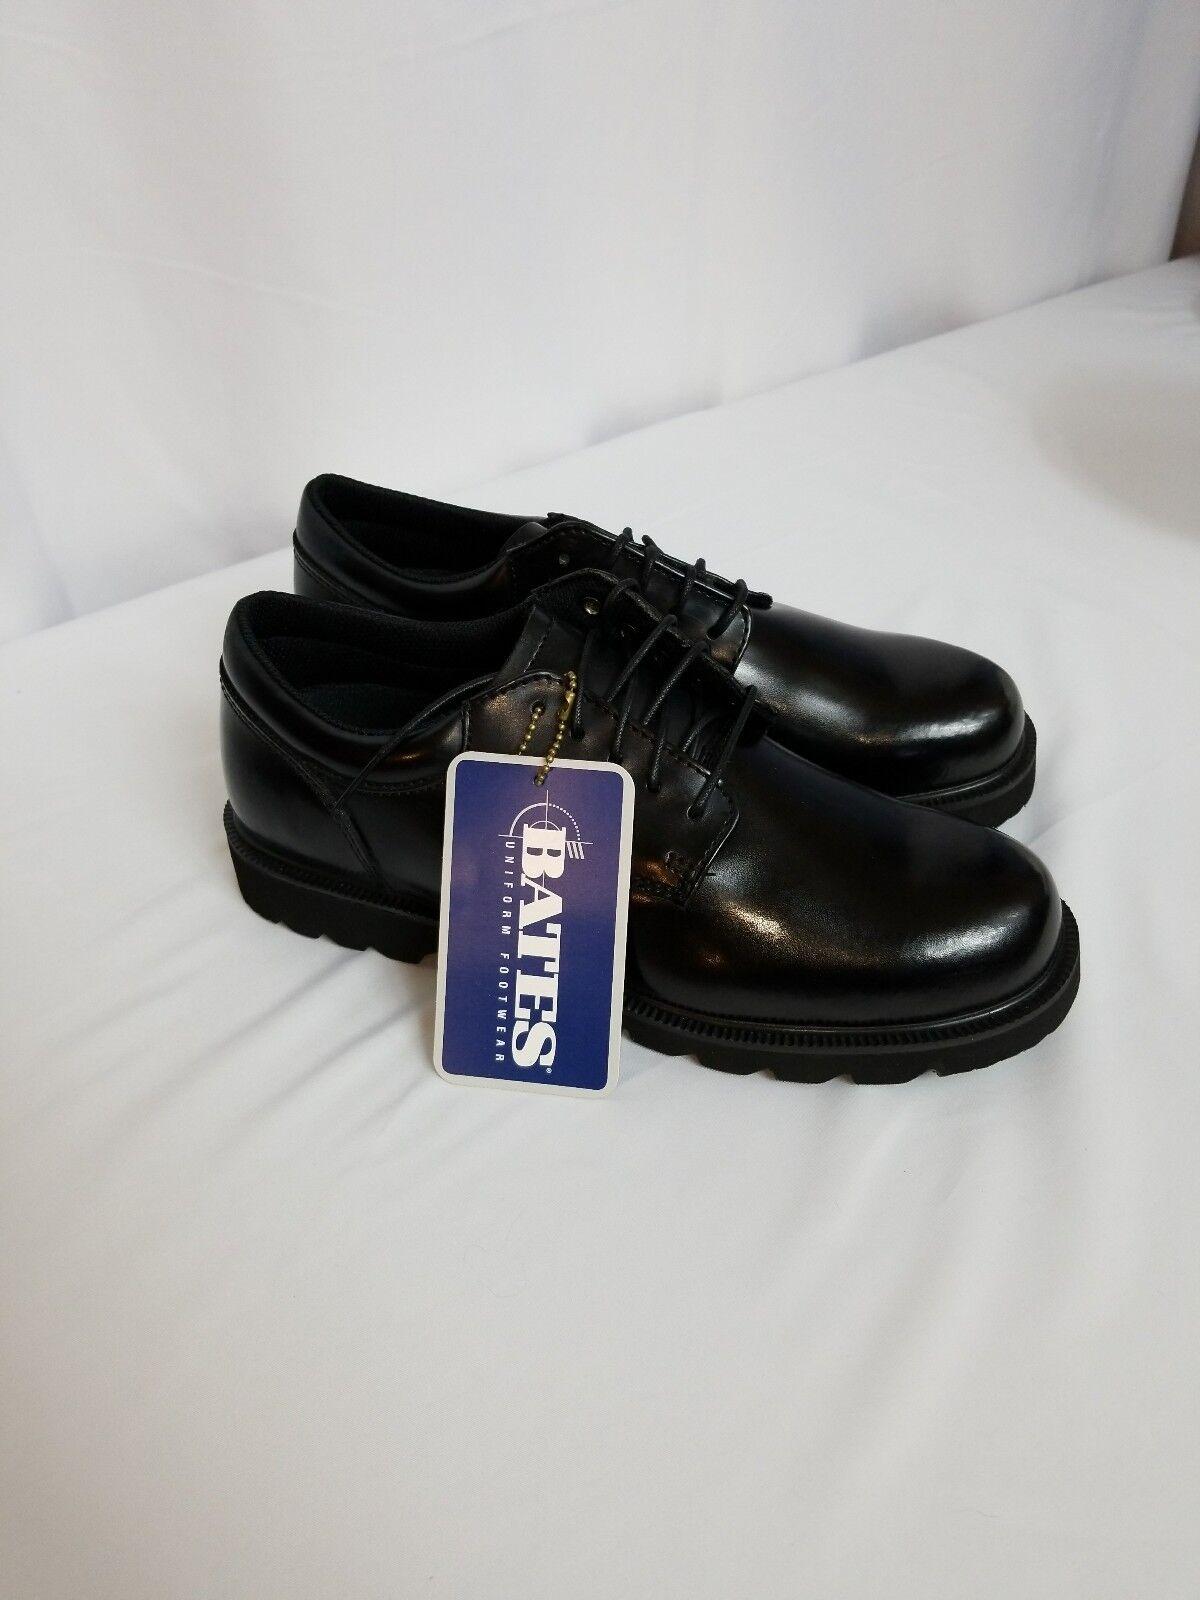 Bates Enforcer Series Black Hi-Gloss Duty OxfordMen s 7.5 M Work/Dress New